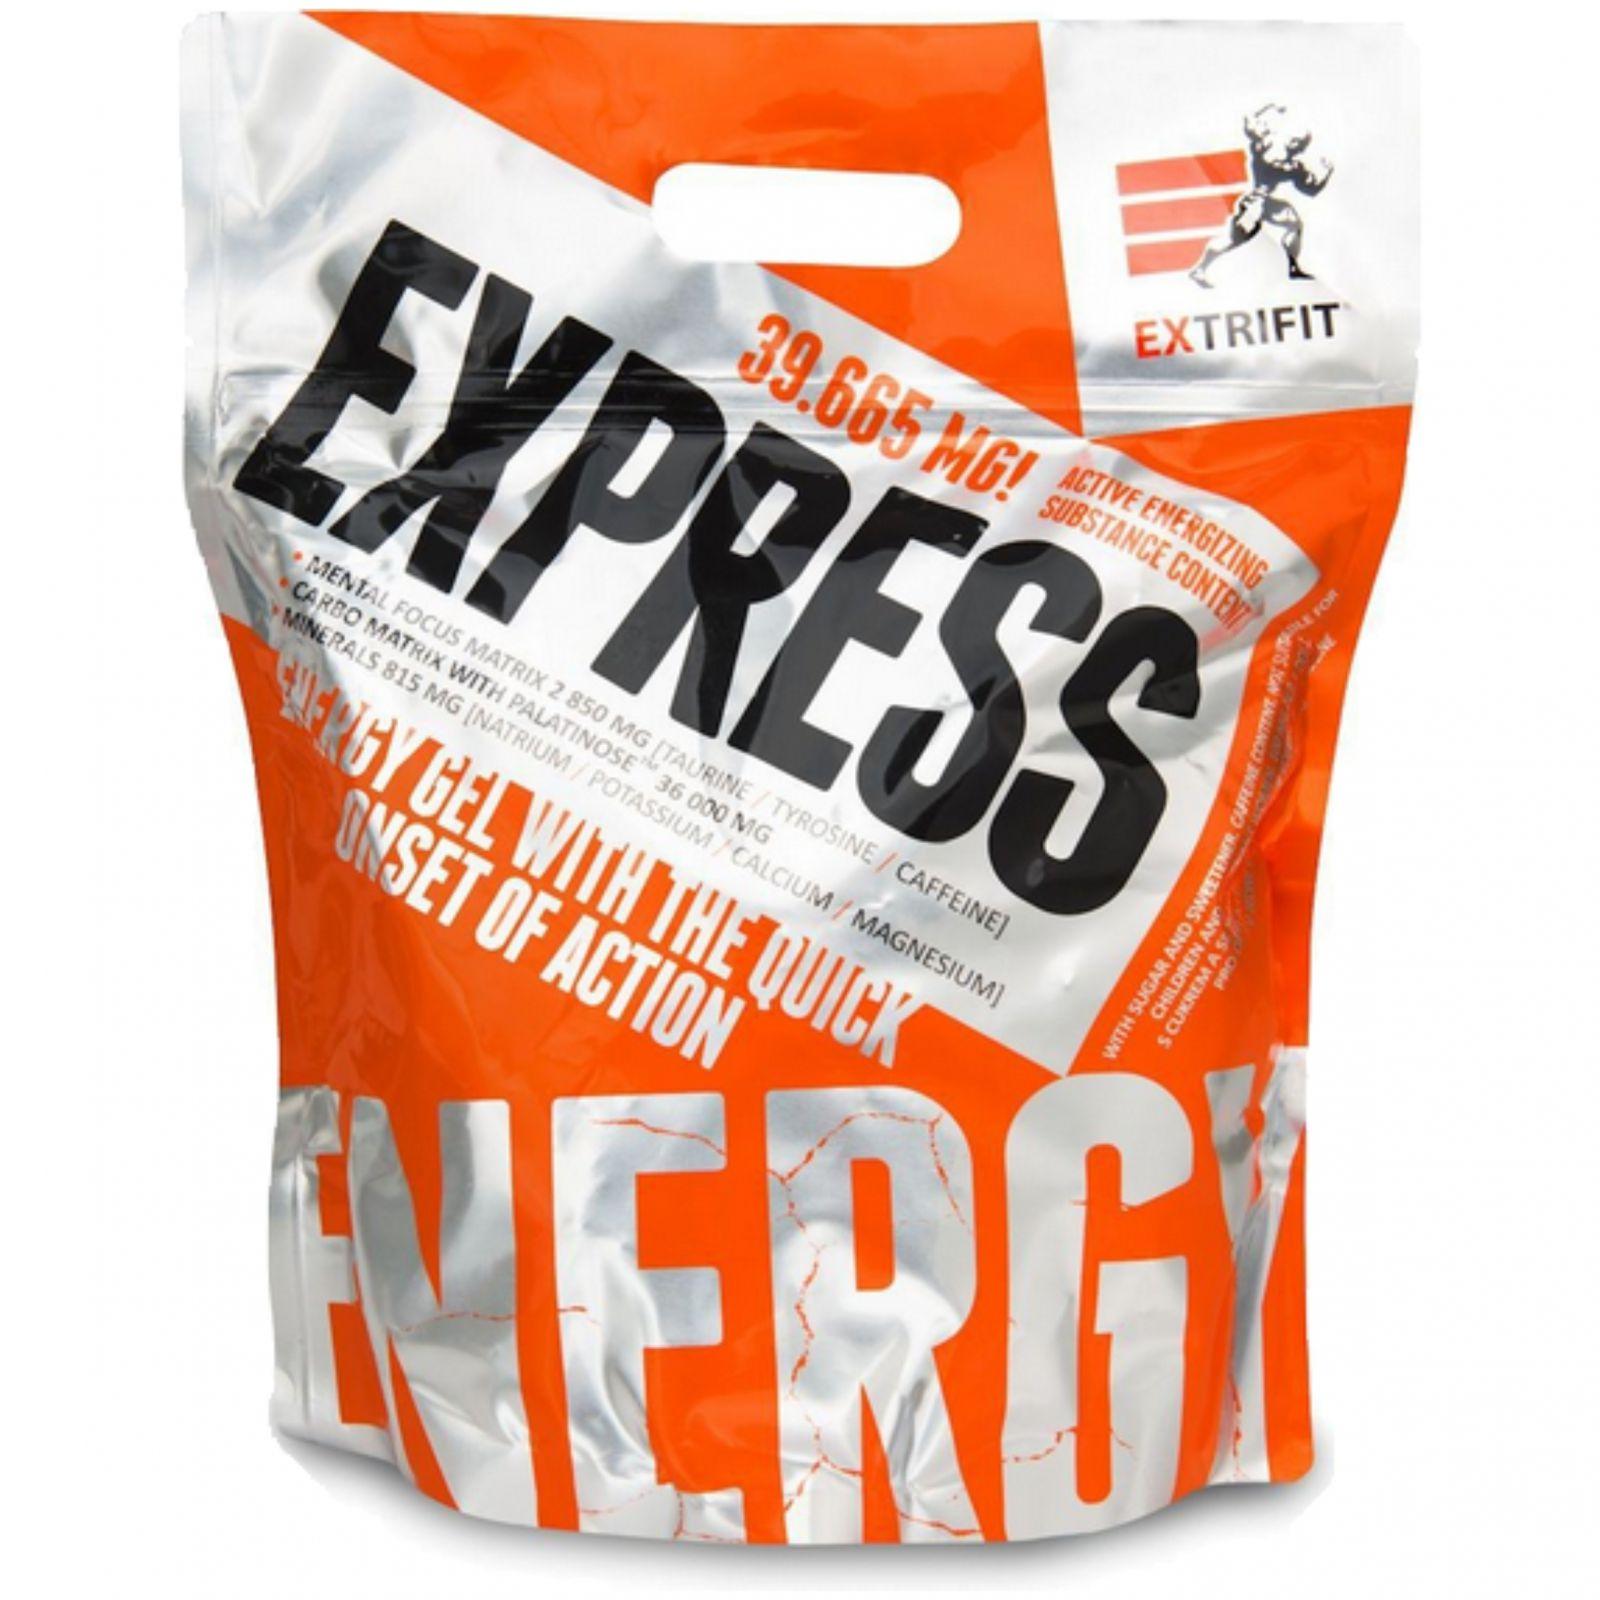 Extrifit Express Energy Gel 25 x 80 g